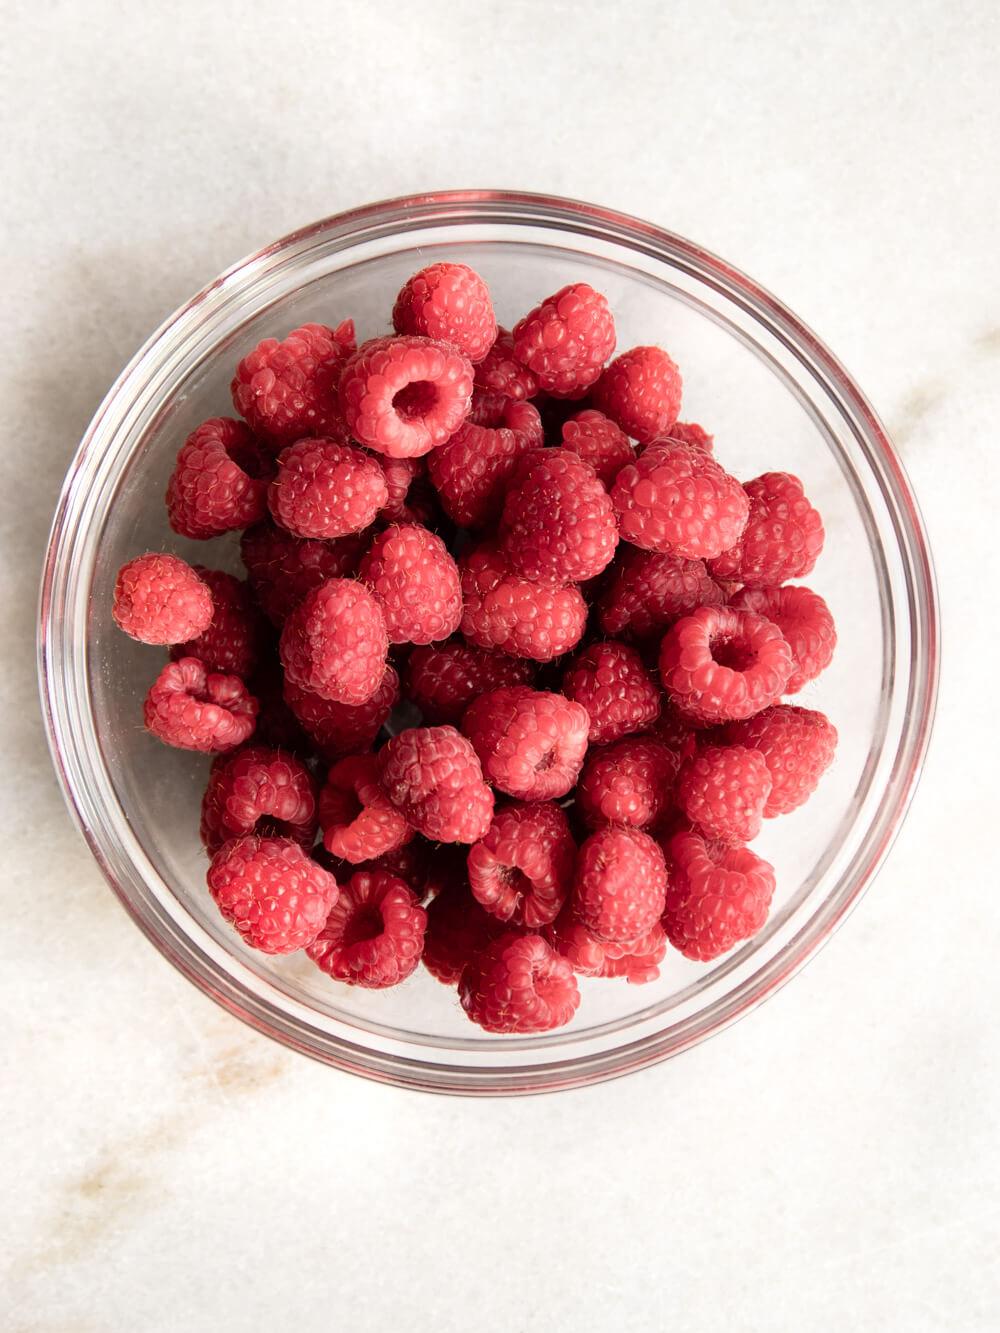 Bowl of fresh raspberries.